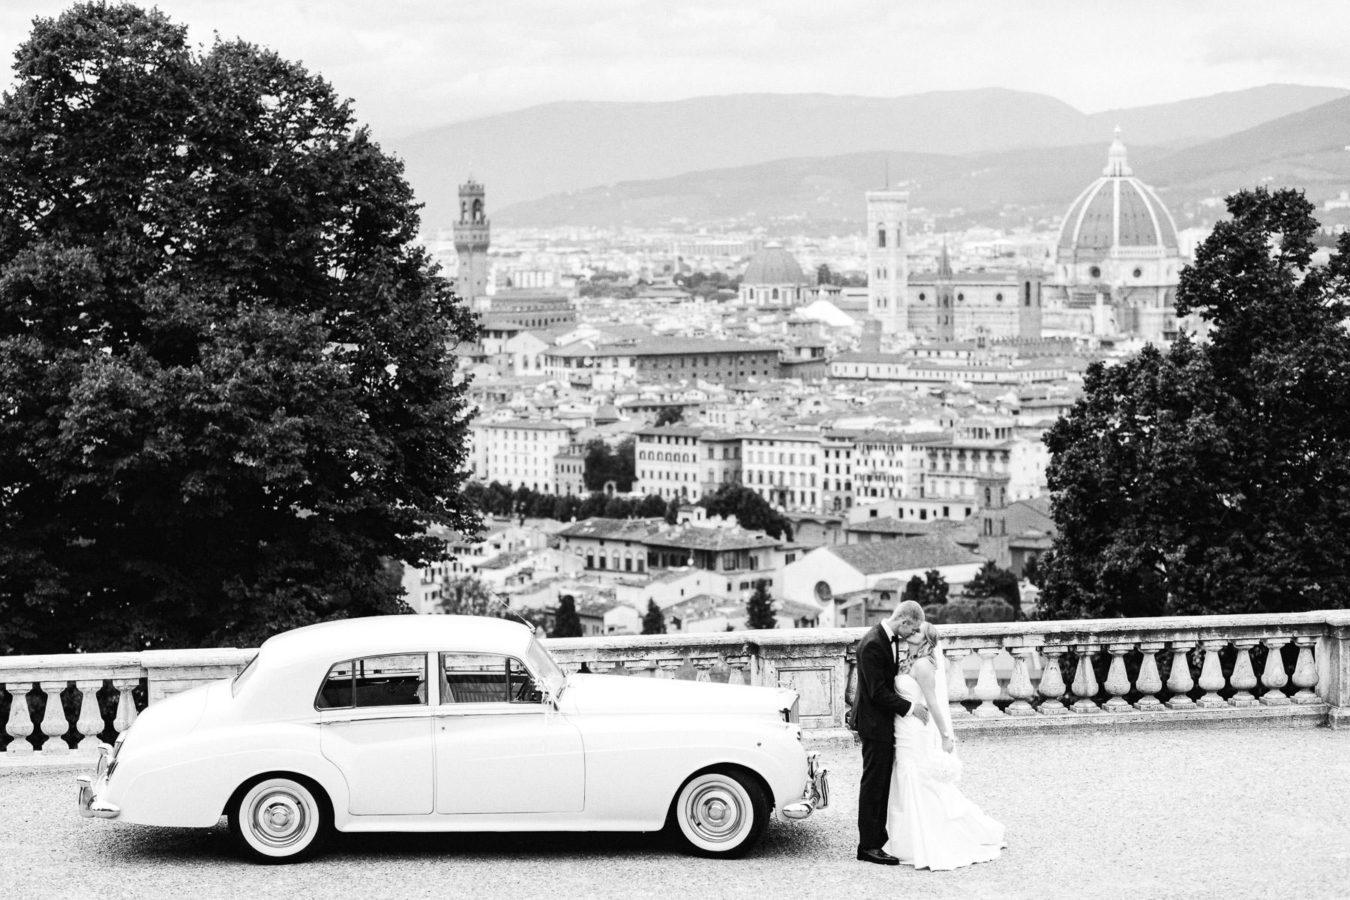 Elegant classic destination wedding in Florence Vintage car Rolls Royce breathtaking Florence view